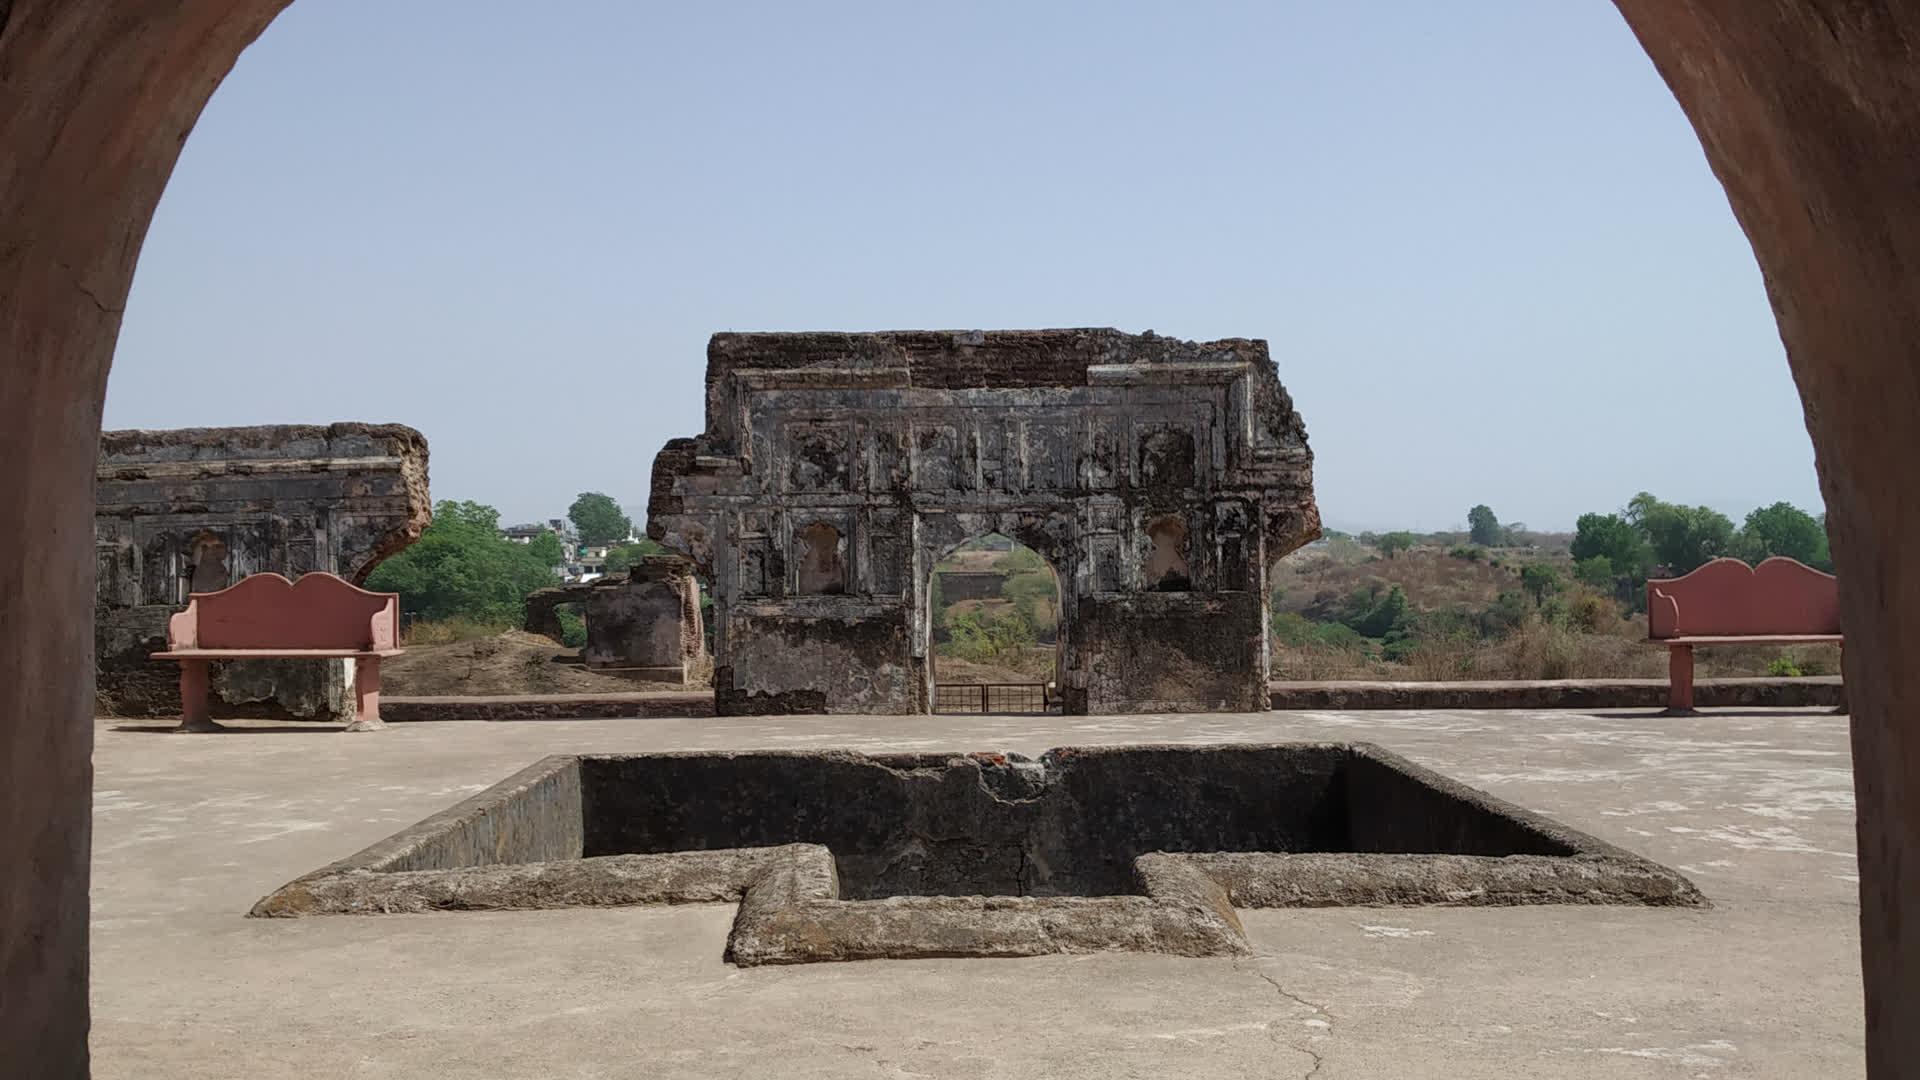 Burhanpur: Gateway to the Deccan